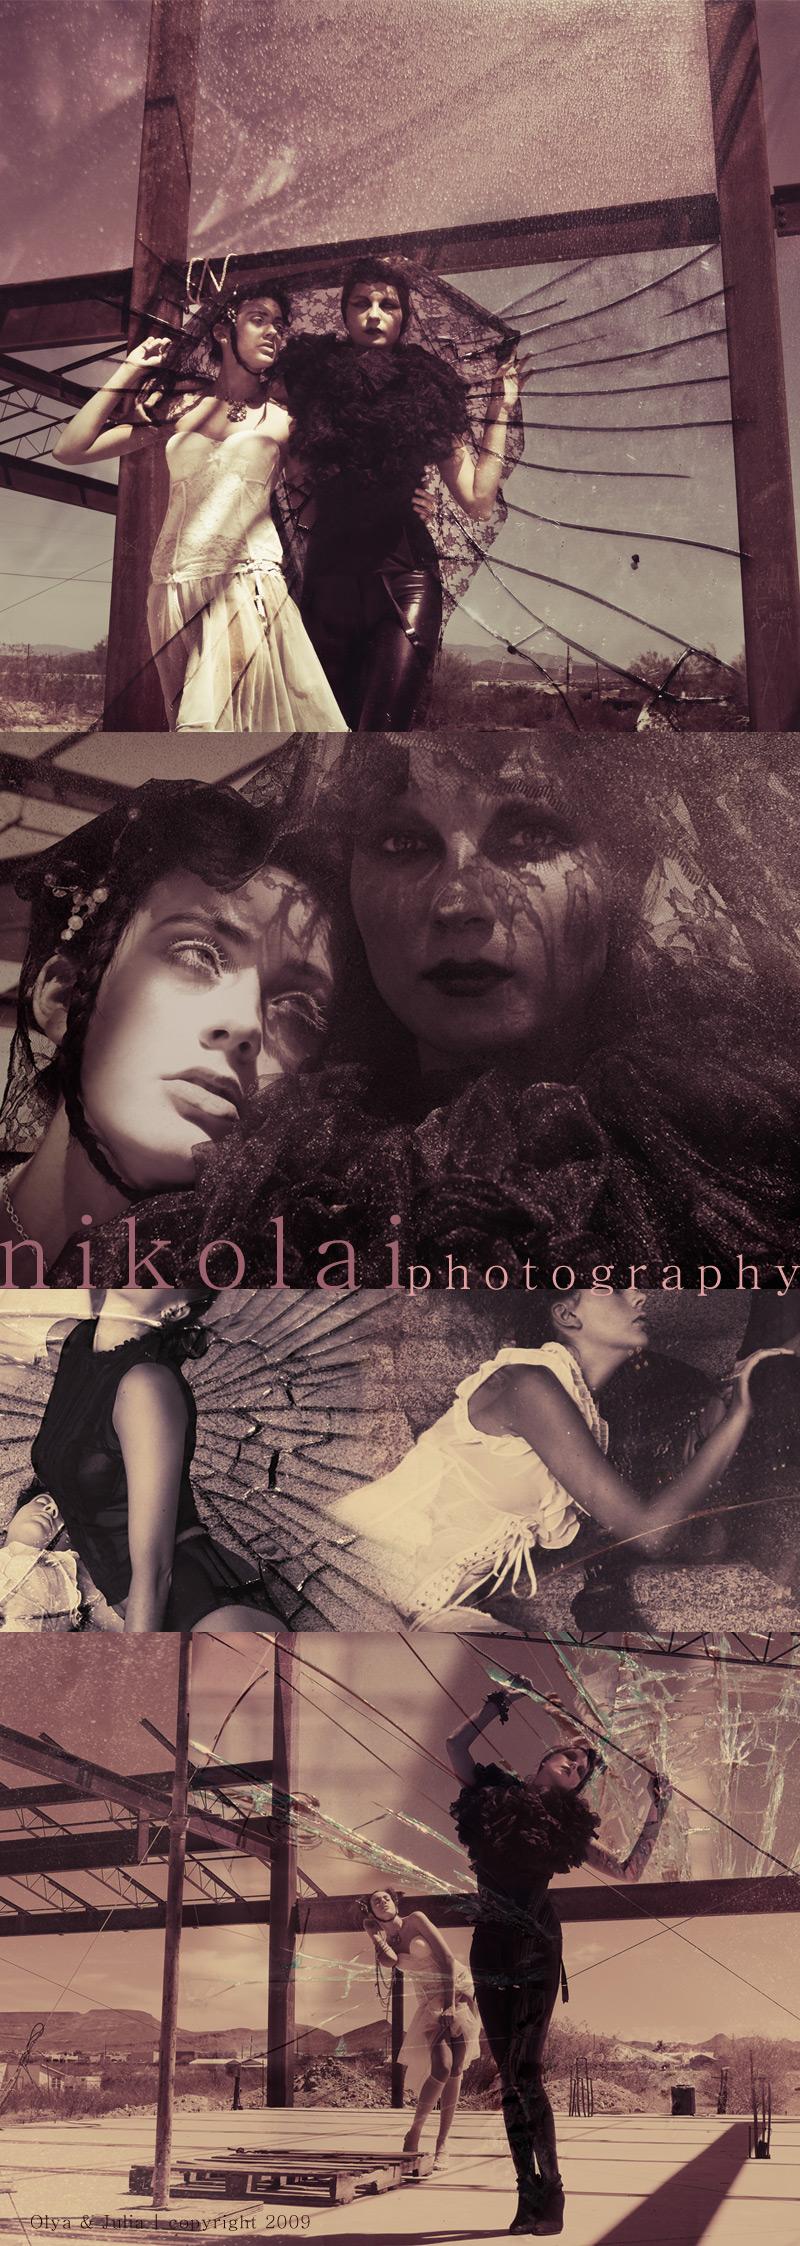 Sep 16, 2009 Nikolai Photography Olya and Julia, The Agency AZ